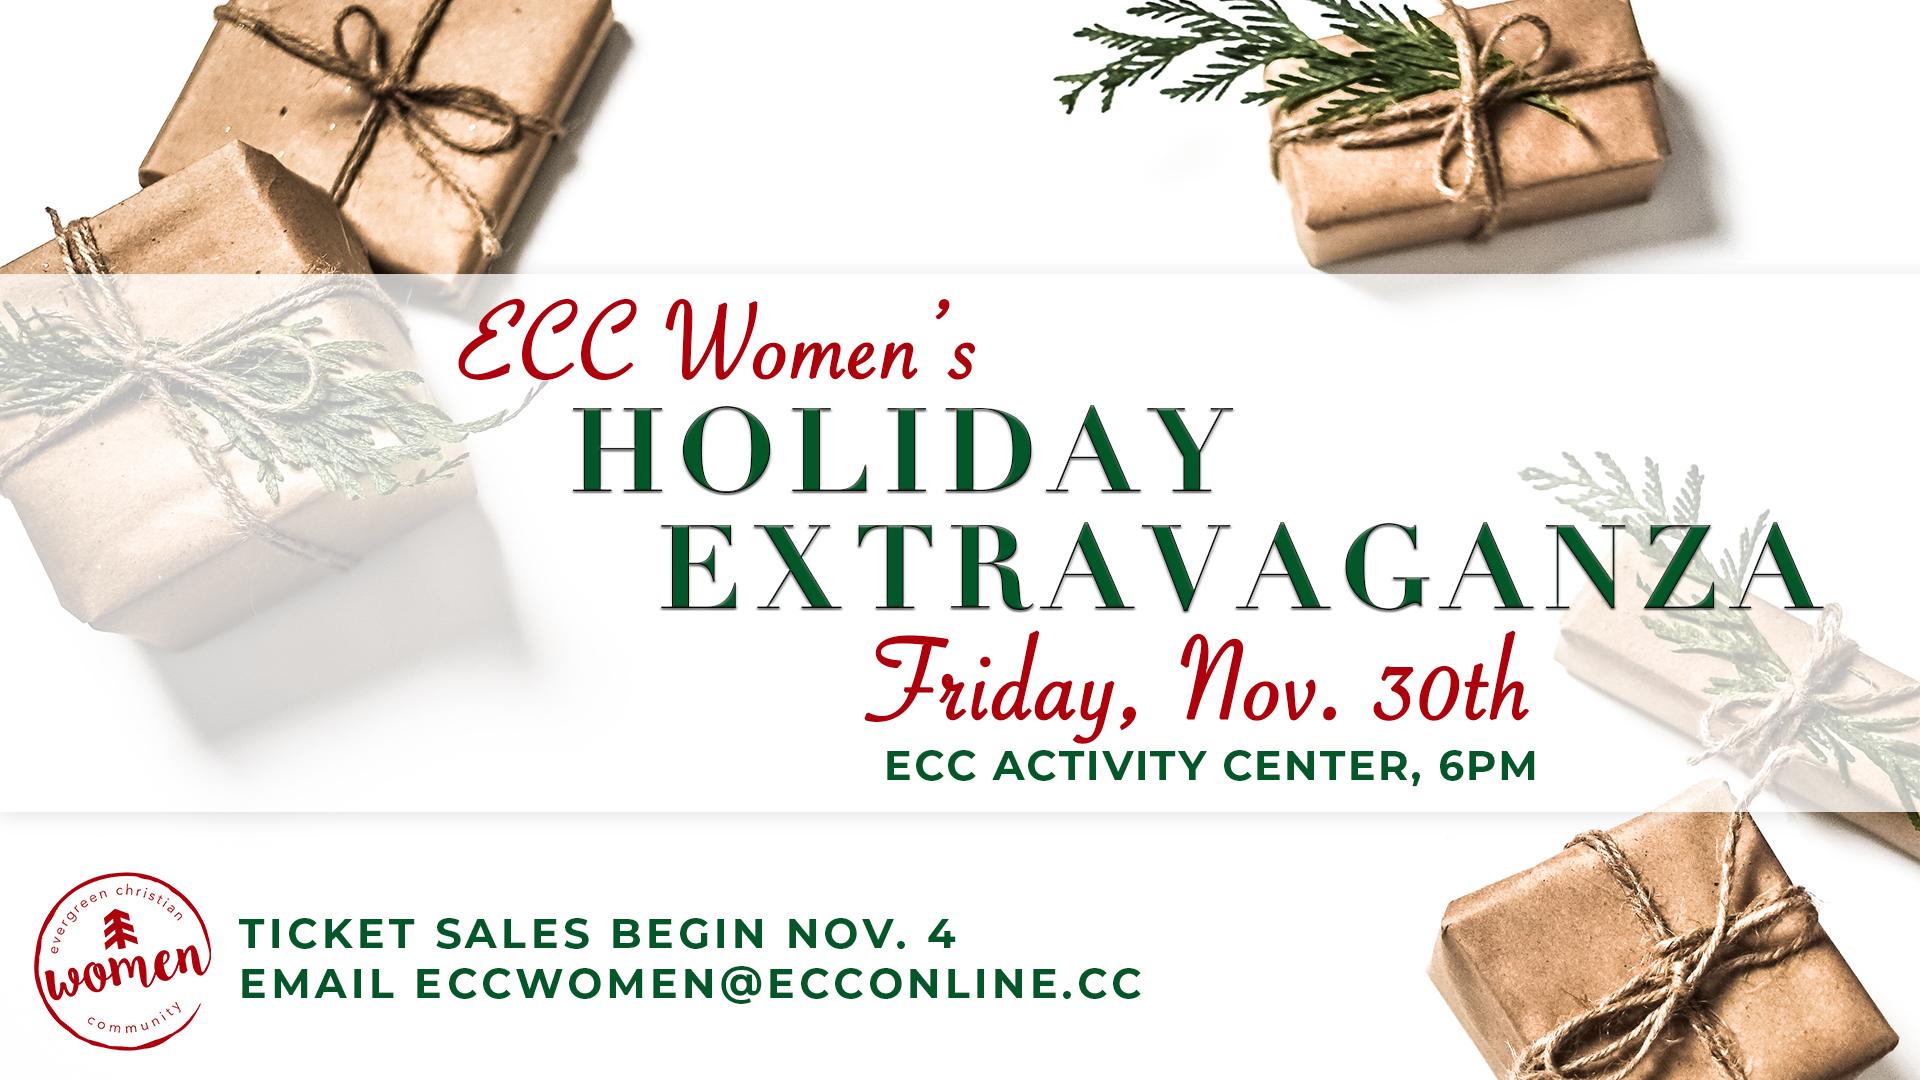 Holiday Extravaganza Ann Slide w logo.jpg